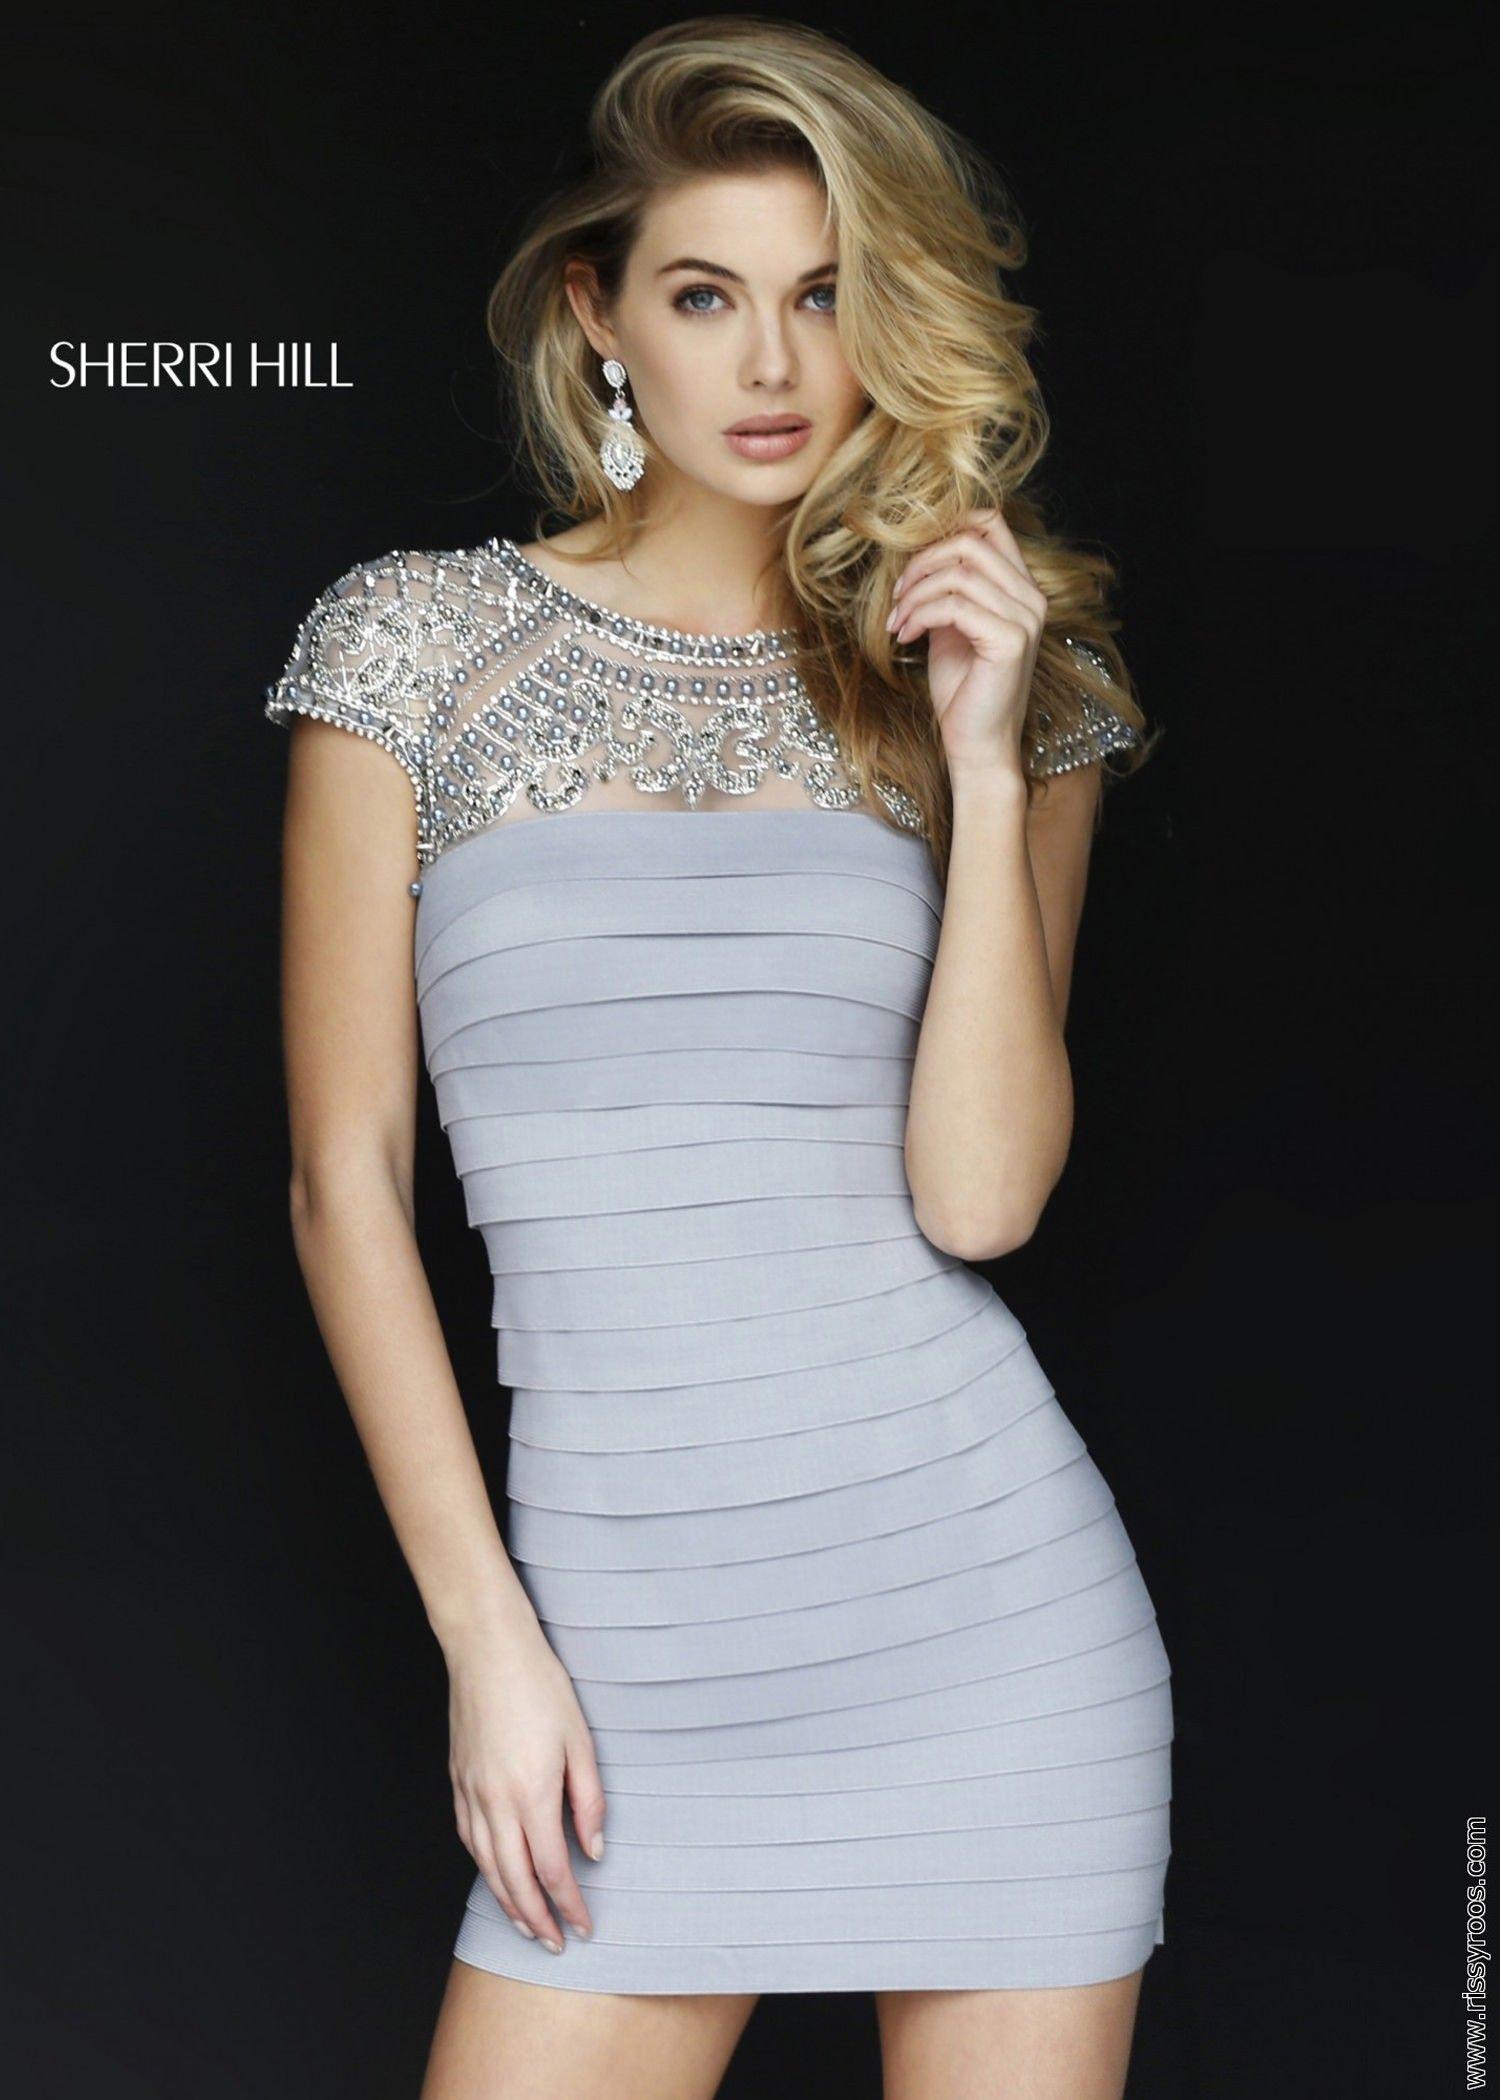 Sherri Hill 32282 Silver Beaded Cap Sleeve Bandage Dress - Homecoming  Dresses - Bodycon Dresses